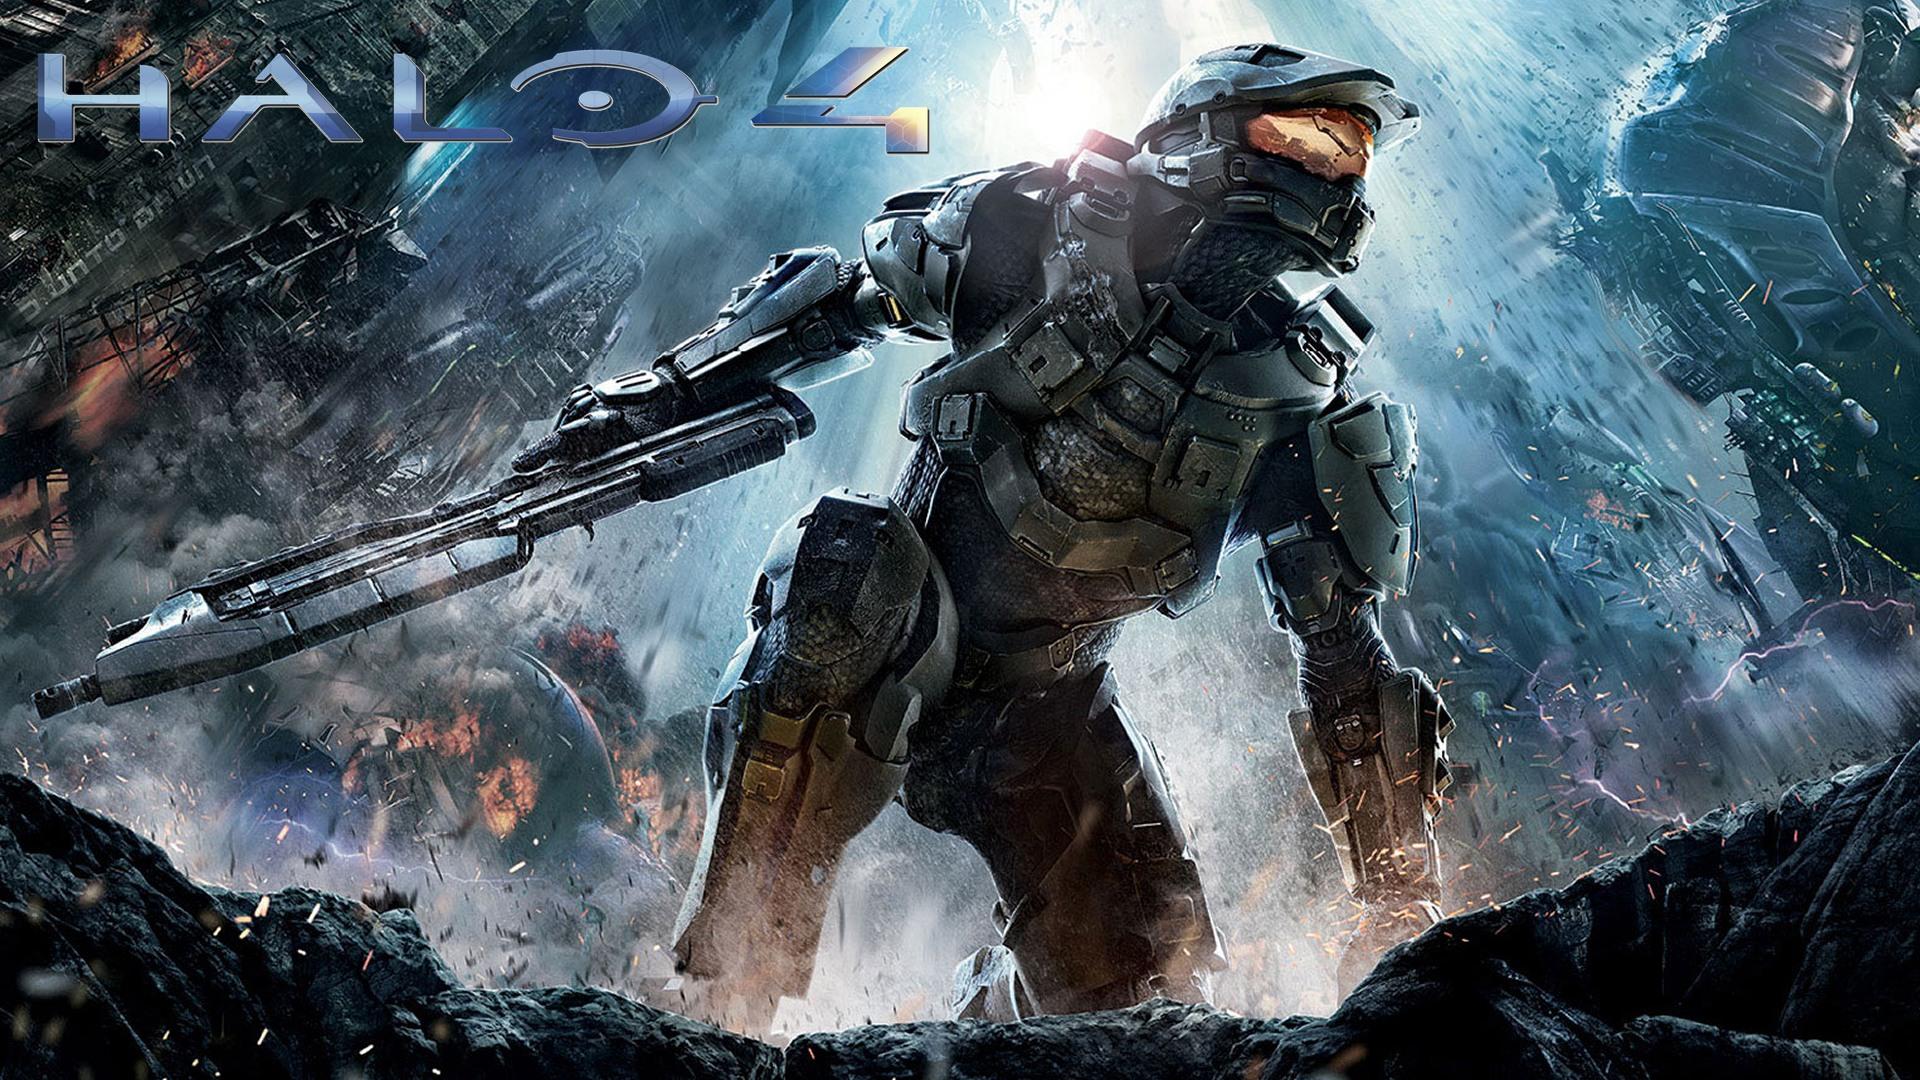 45] Cool Halo 4 Wallpaper on WallpaperSafari 1920x1080